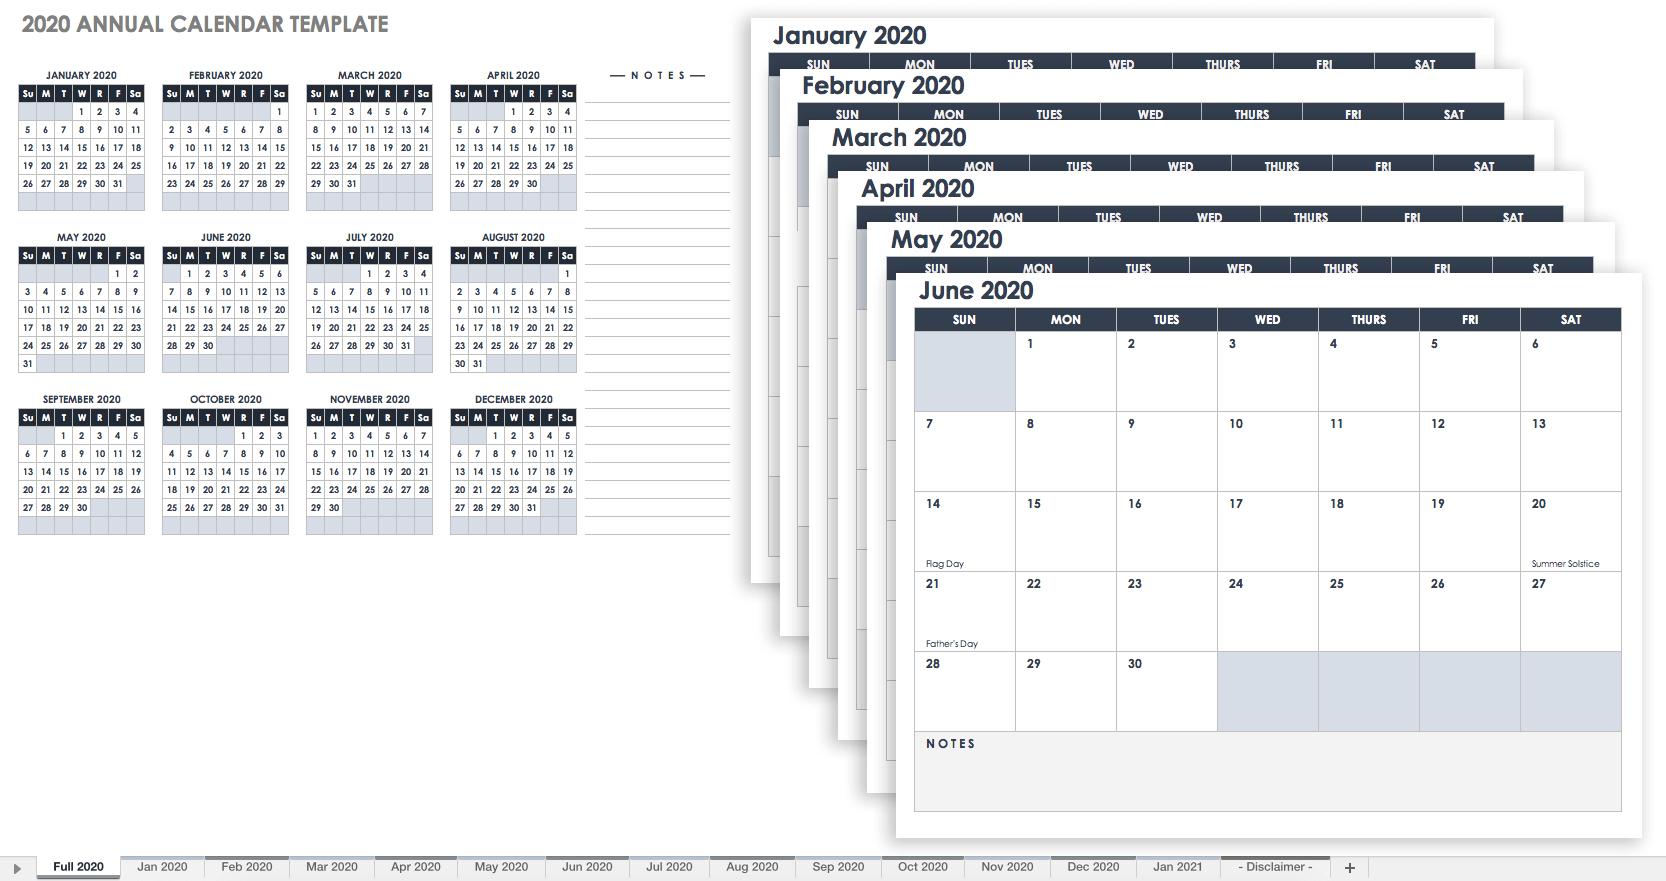 Free Blank Calendar Templates - Smartsheet 9/80 Calendar 2019